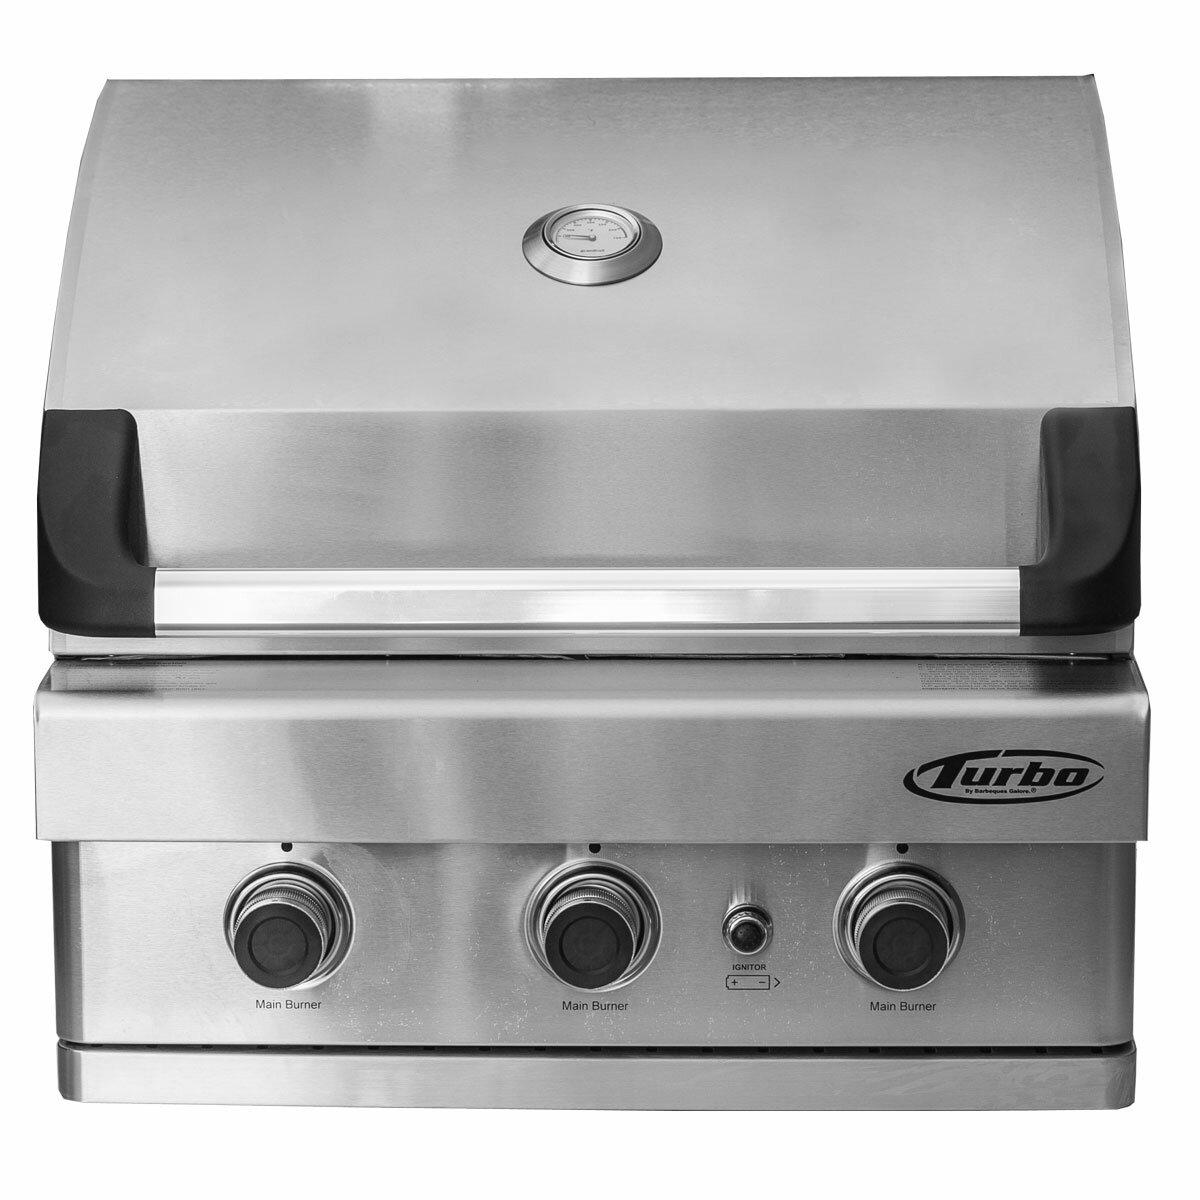 blaze grills 25 grill cart for 3 burner gas grill reviews wayfair ...